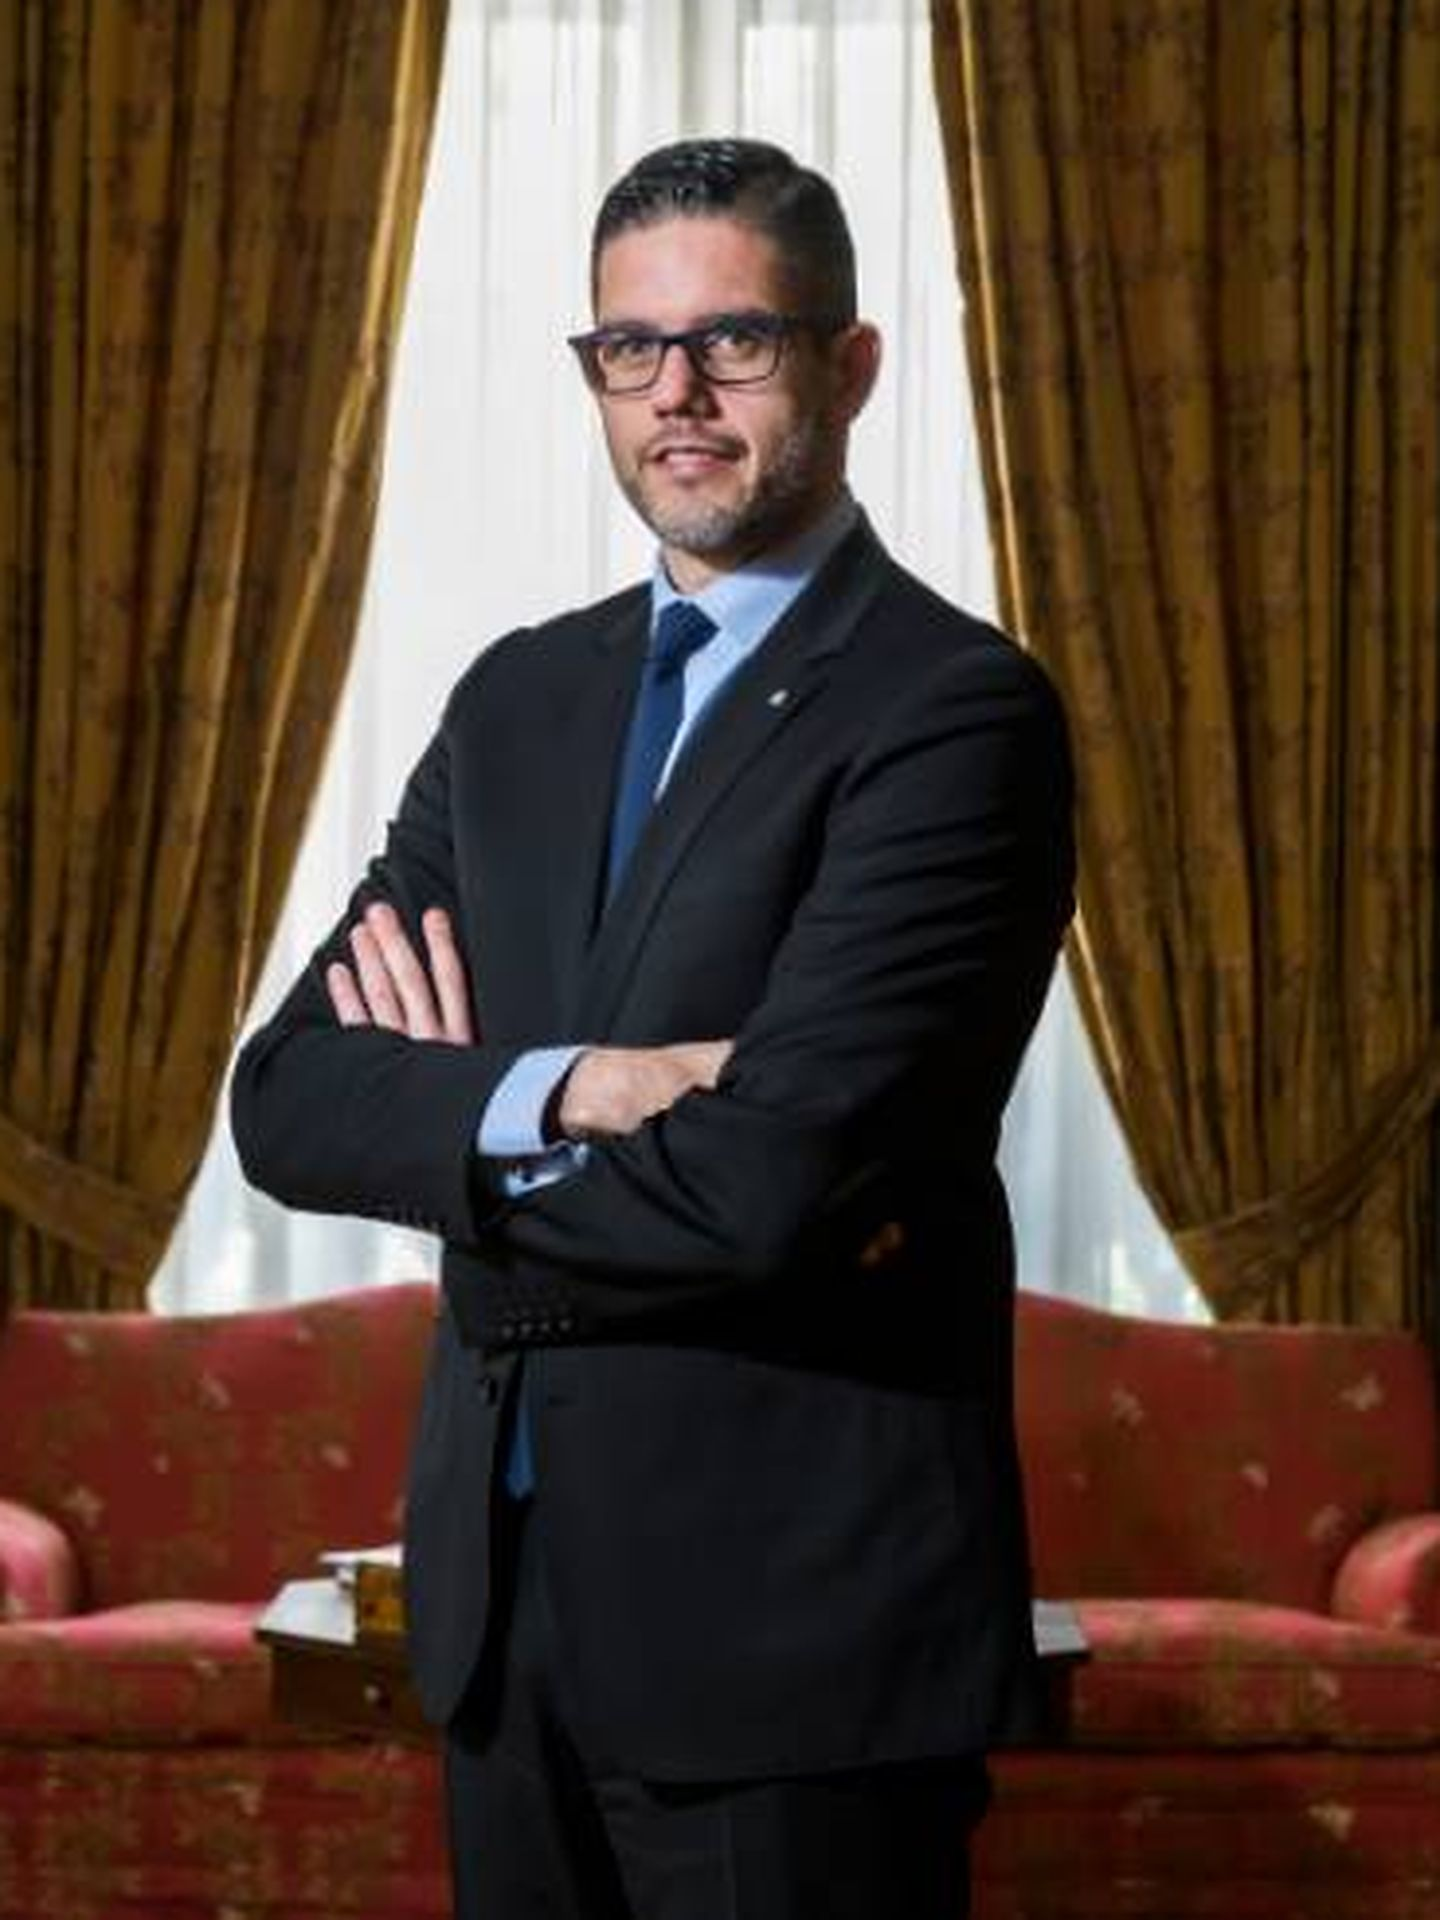 El presidente de Costa Cruceros, Neil Palomba